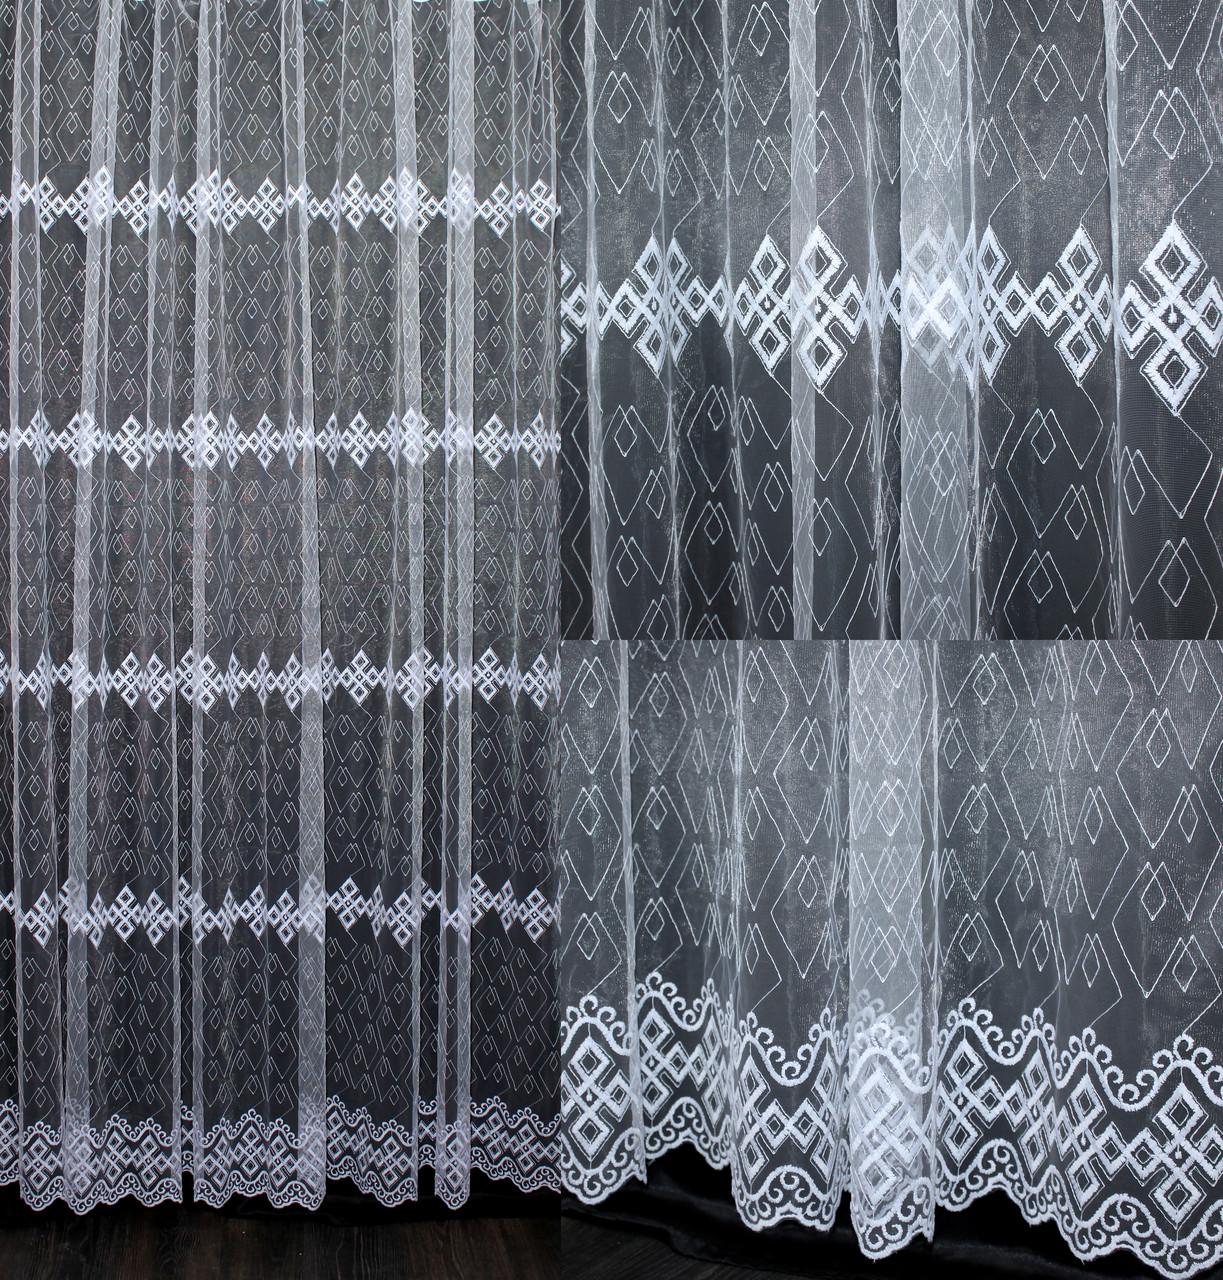 Гардина фатин с вышивкой.Цвет белый.  Код 541ту (1,9*2,7м)